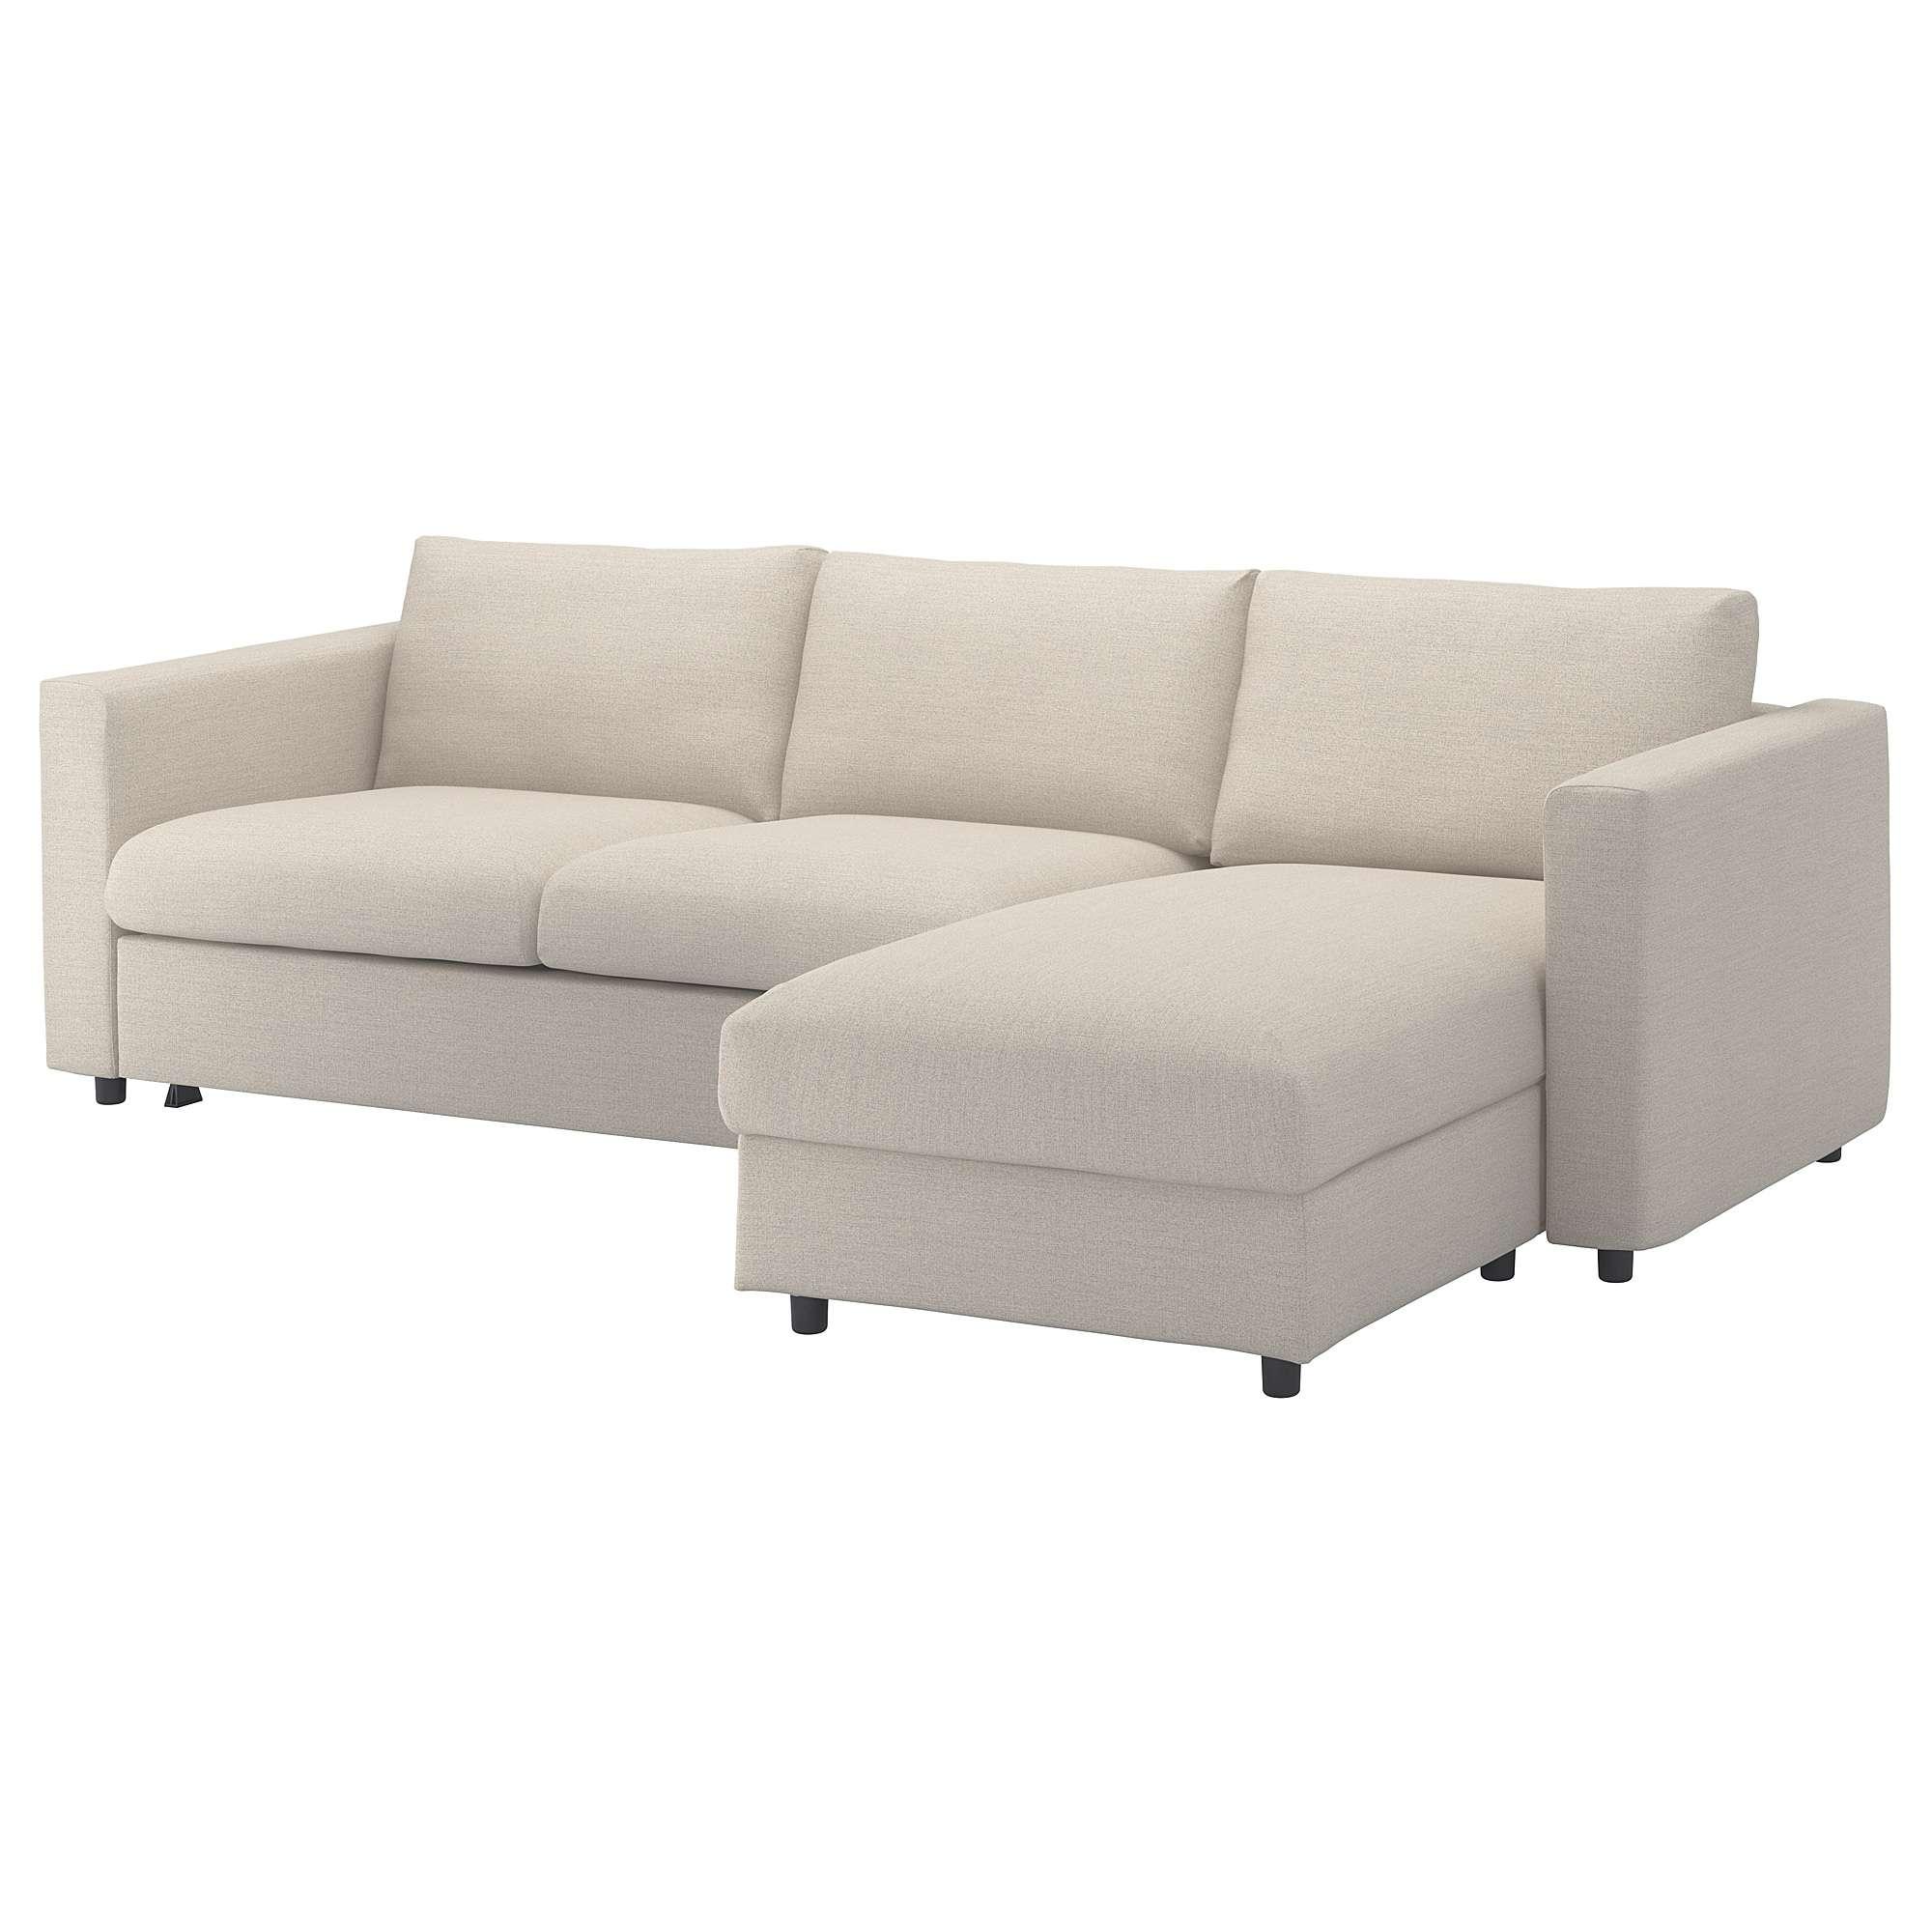 Vimle Sleeper Sofa with Chaise